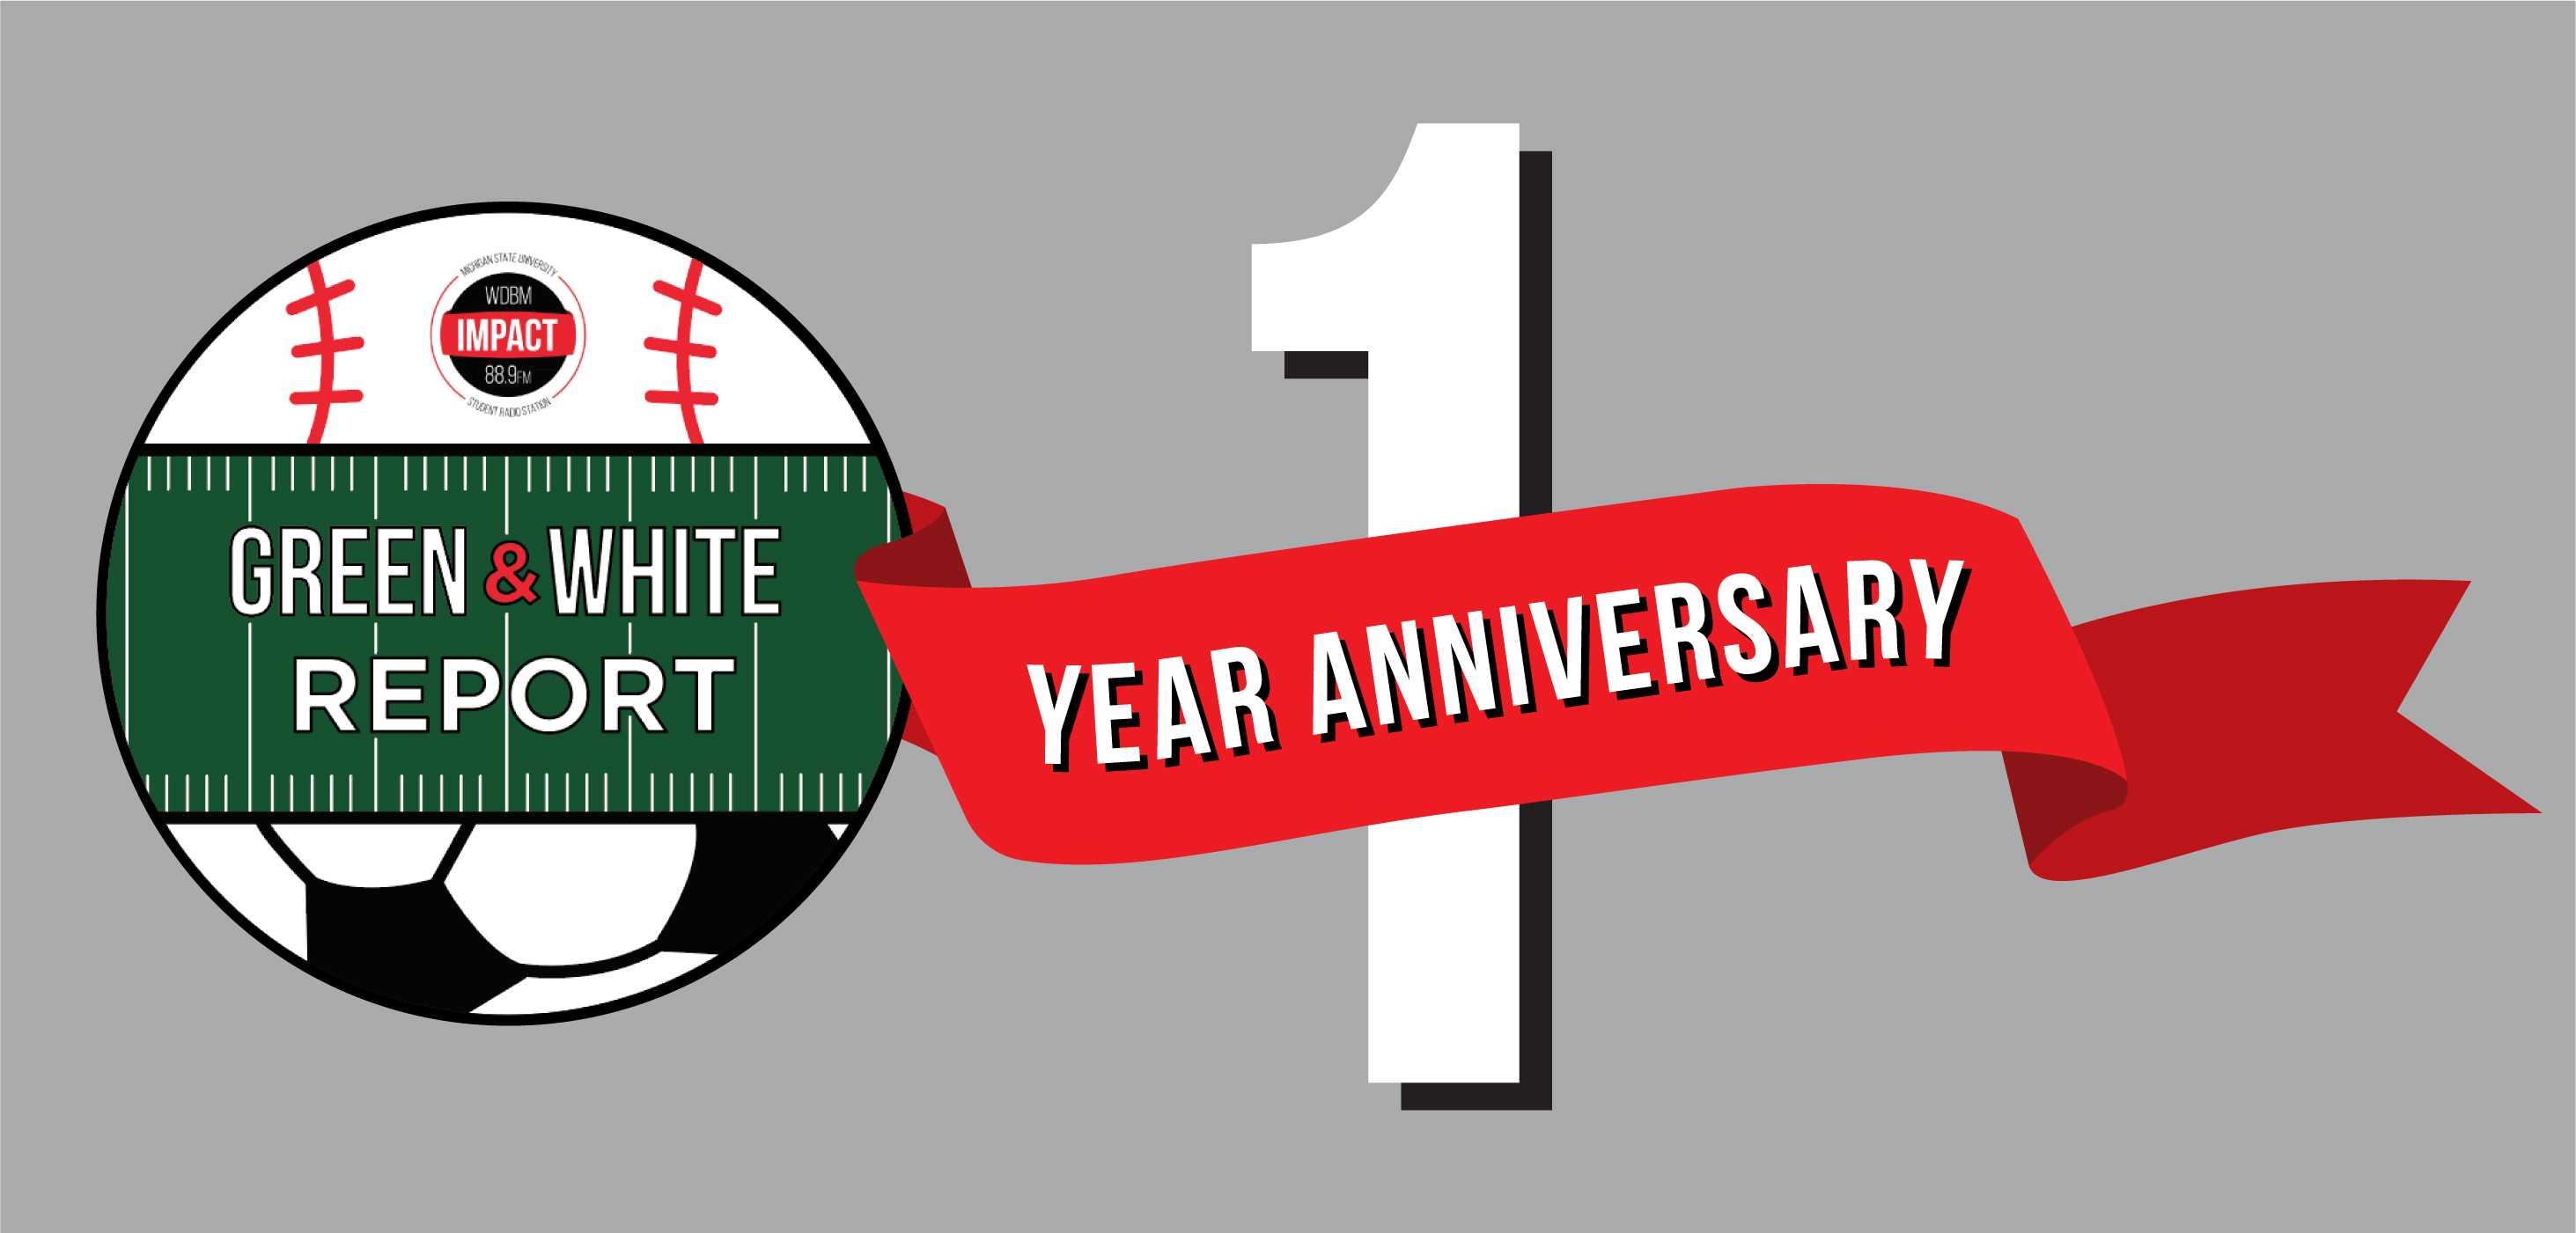 Episode 47: One Year Anniversary